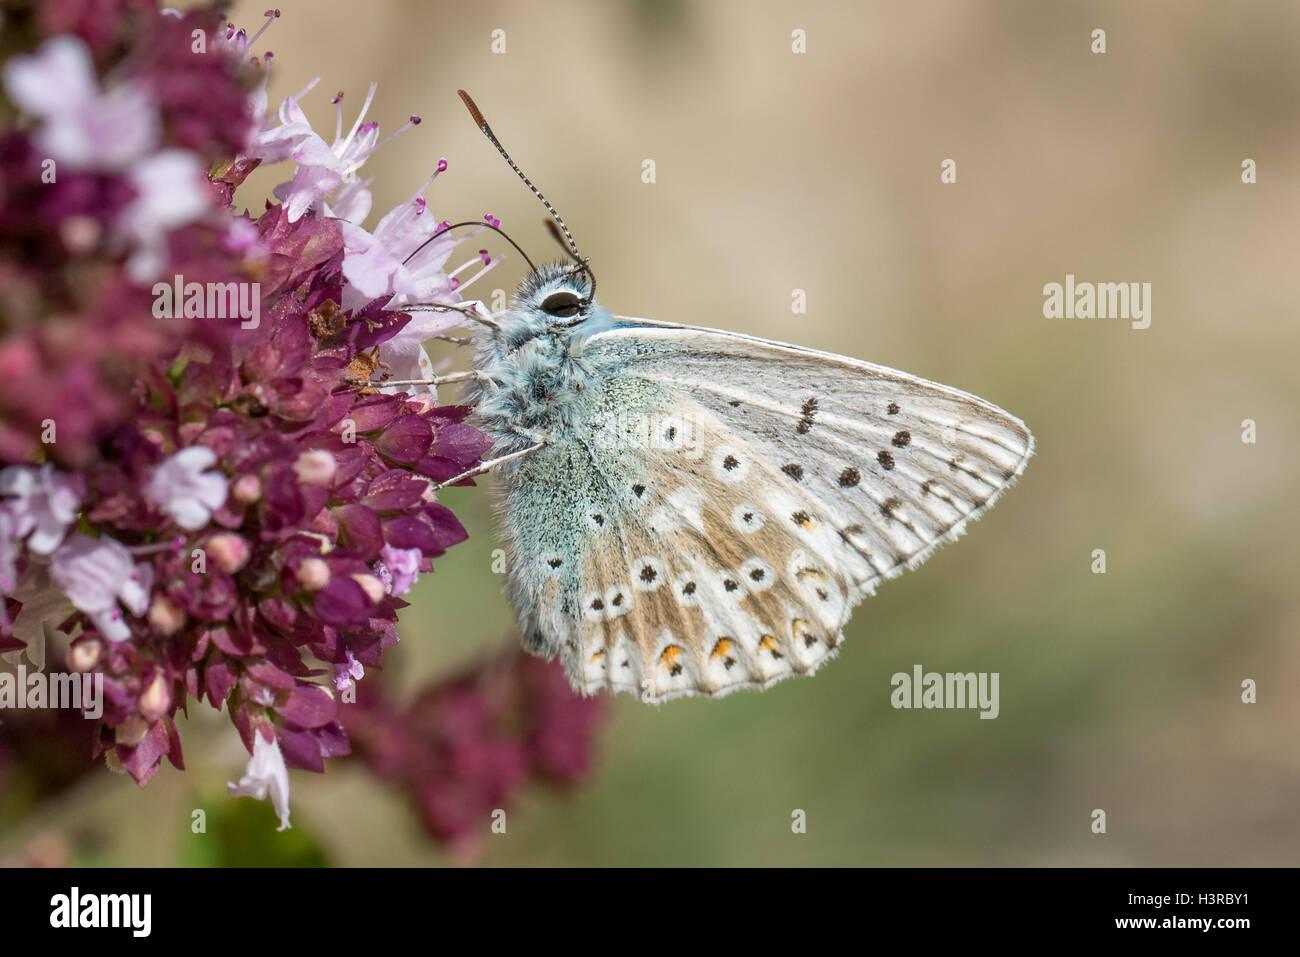 Chalkhill Blue butterfly (Polyommatus coridon) feeding on  Wild Marjoram flowers - Stock Image